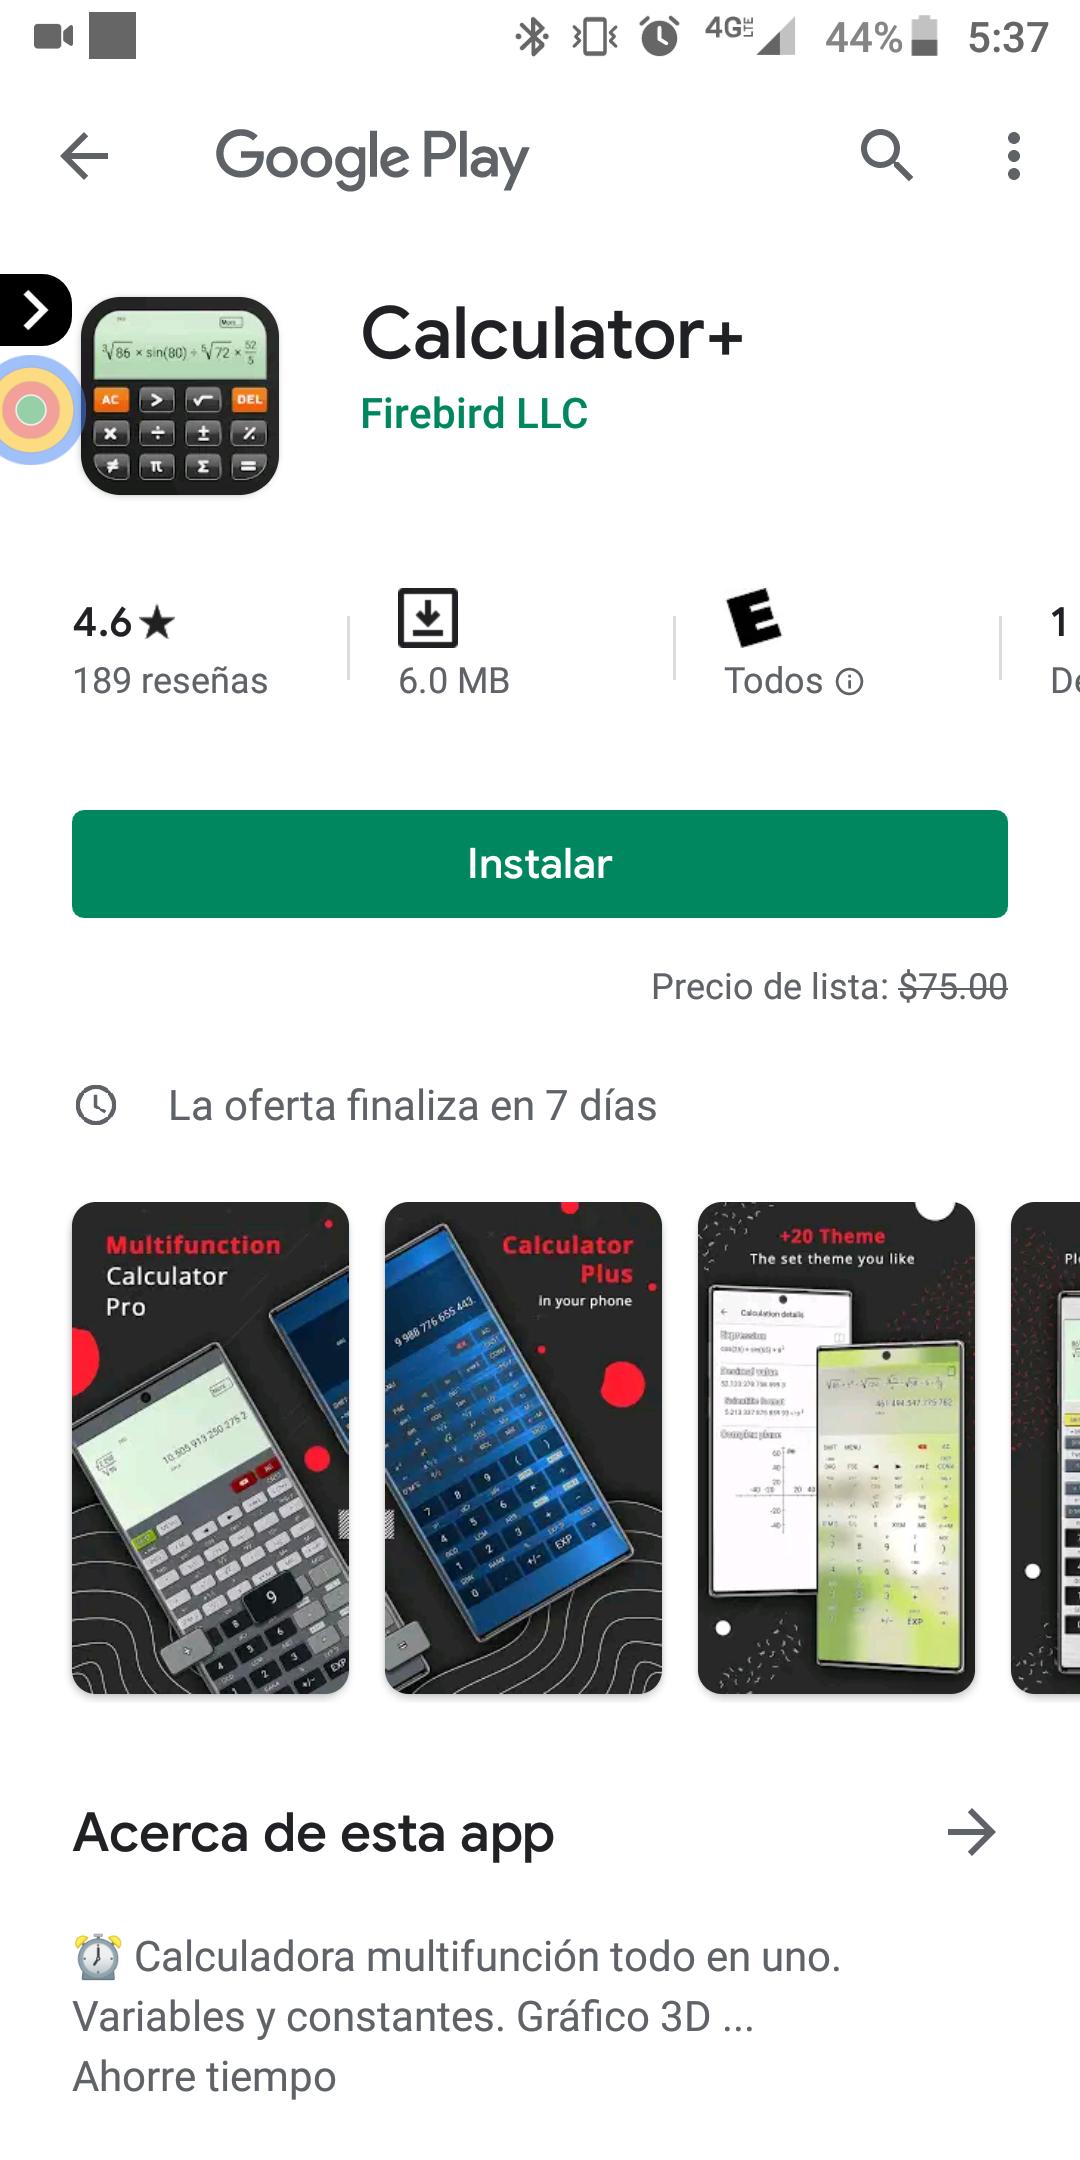 Google Play: Calculator +